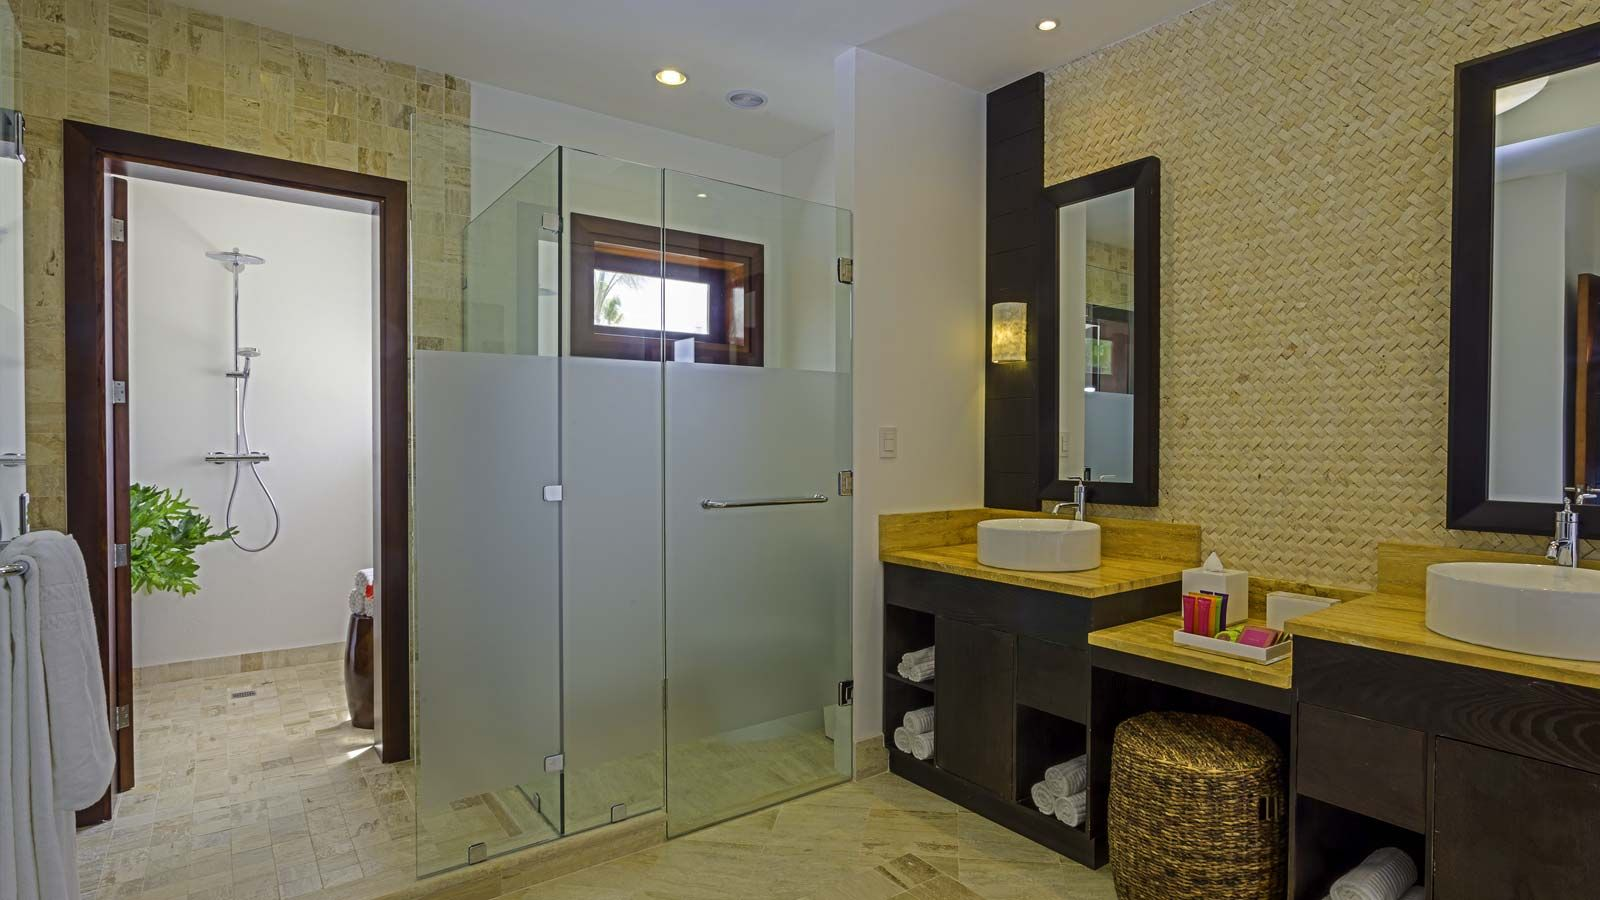 Luxury anguilla on pinterest 17 pins for Caribbean bathroom ideas